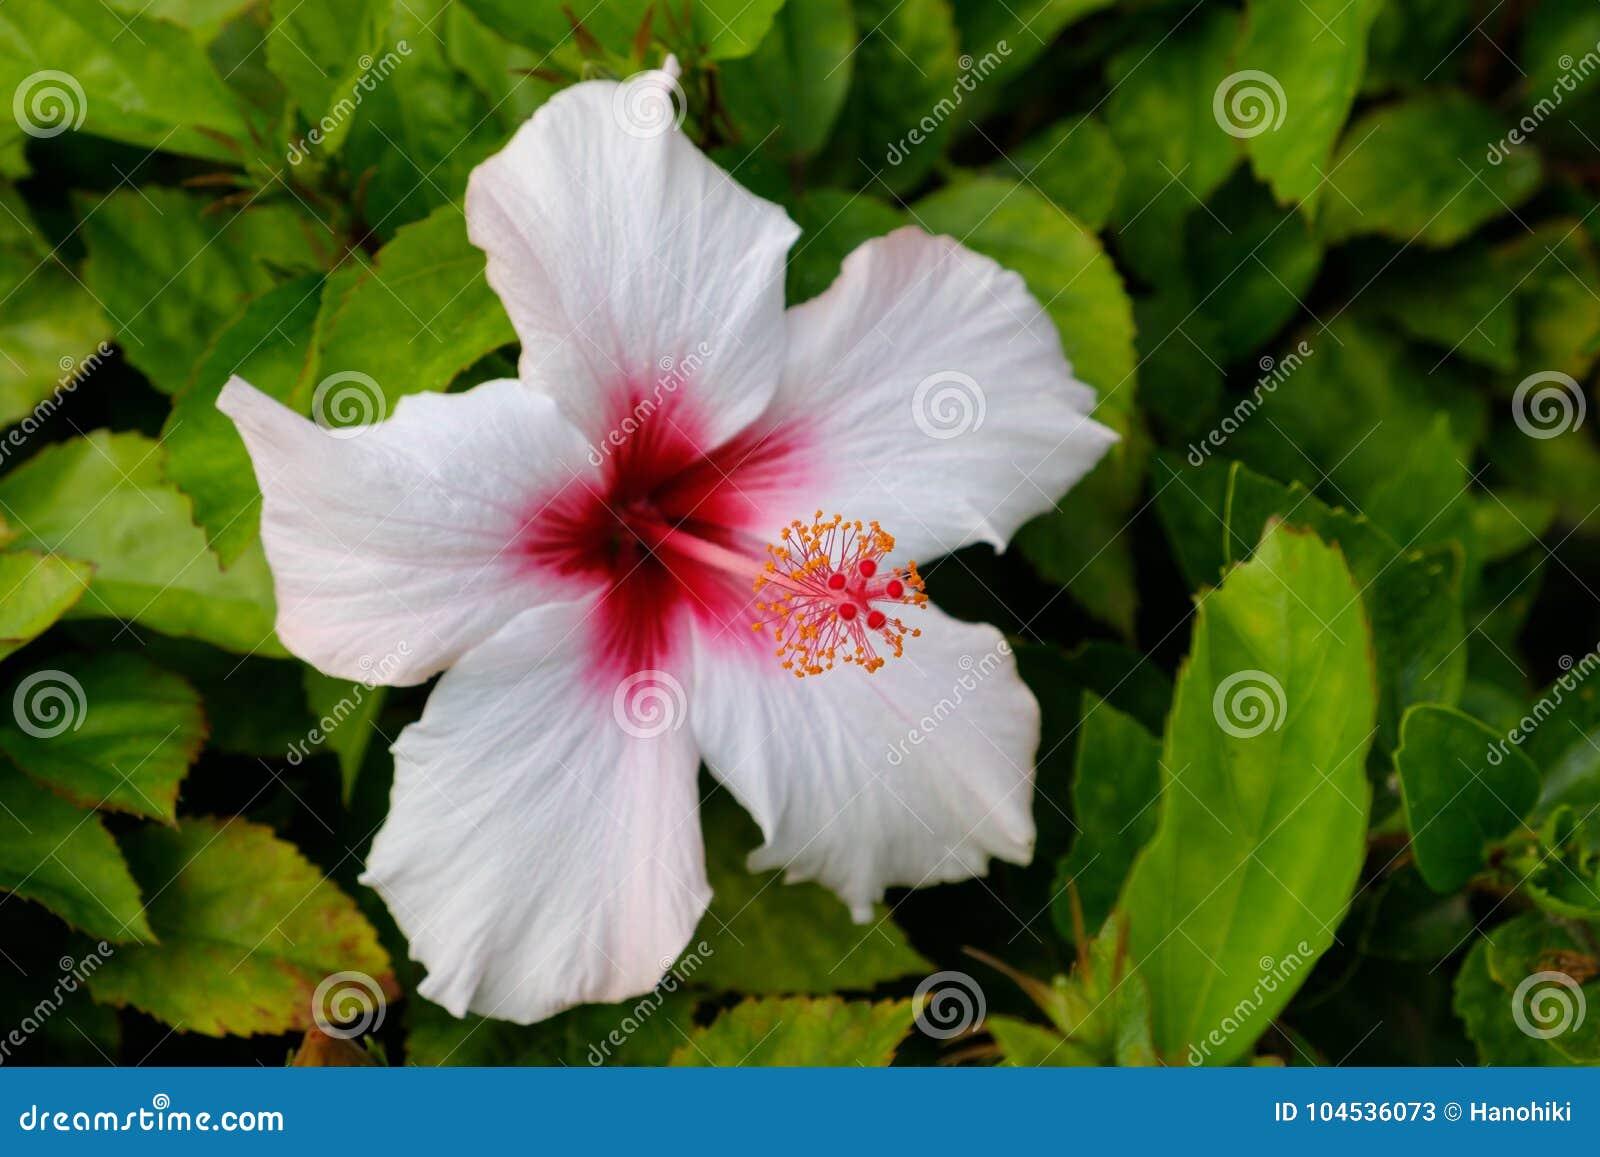 Hibiscus Flower Closeup Blooming White Hibiscus Stock Image